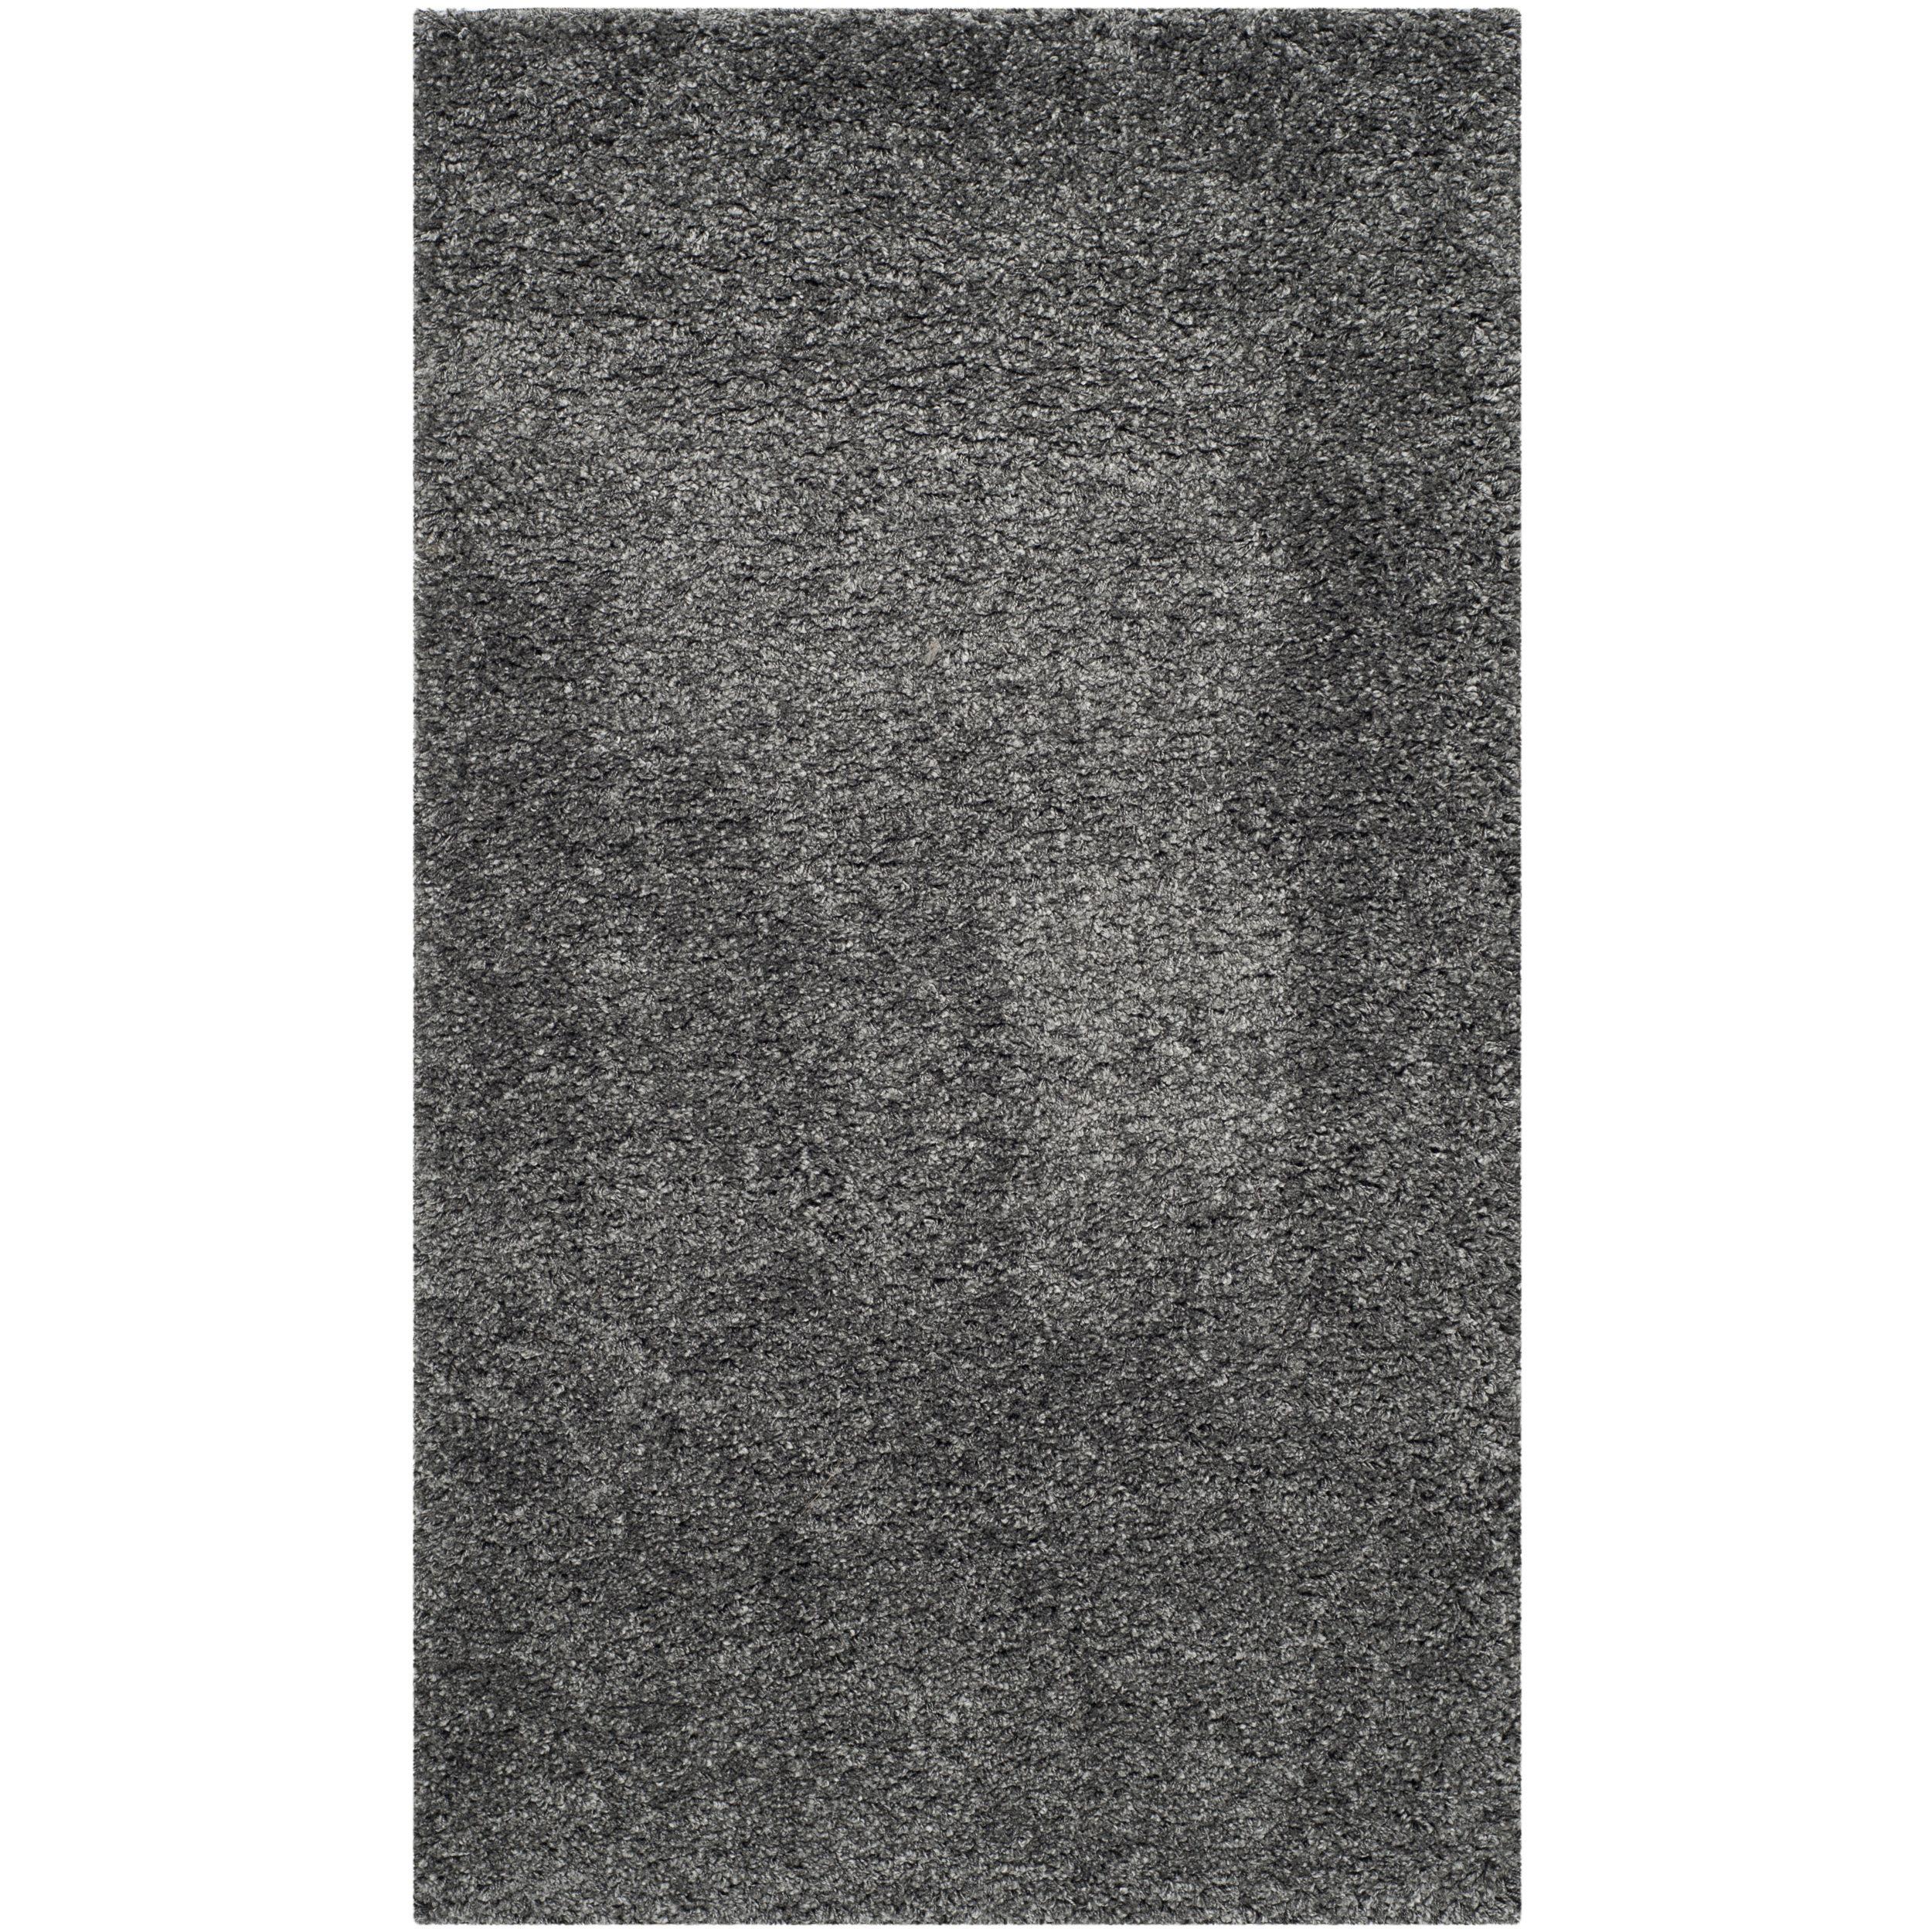 rug rugs grey studio ca light pdp reviews tadlock wayfair wrought woven area hand